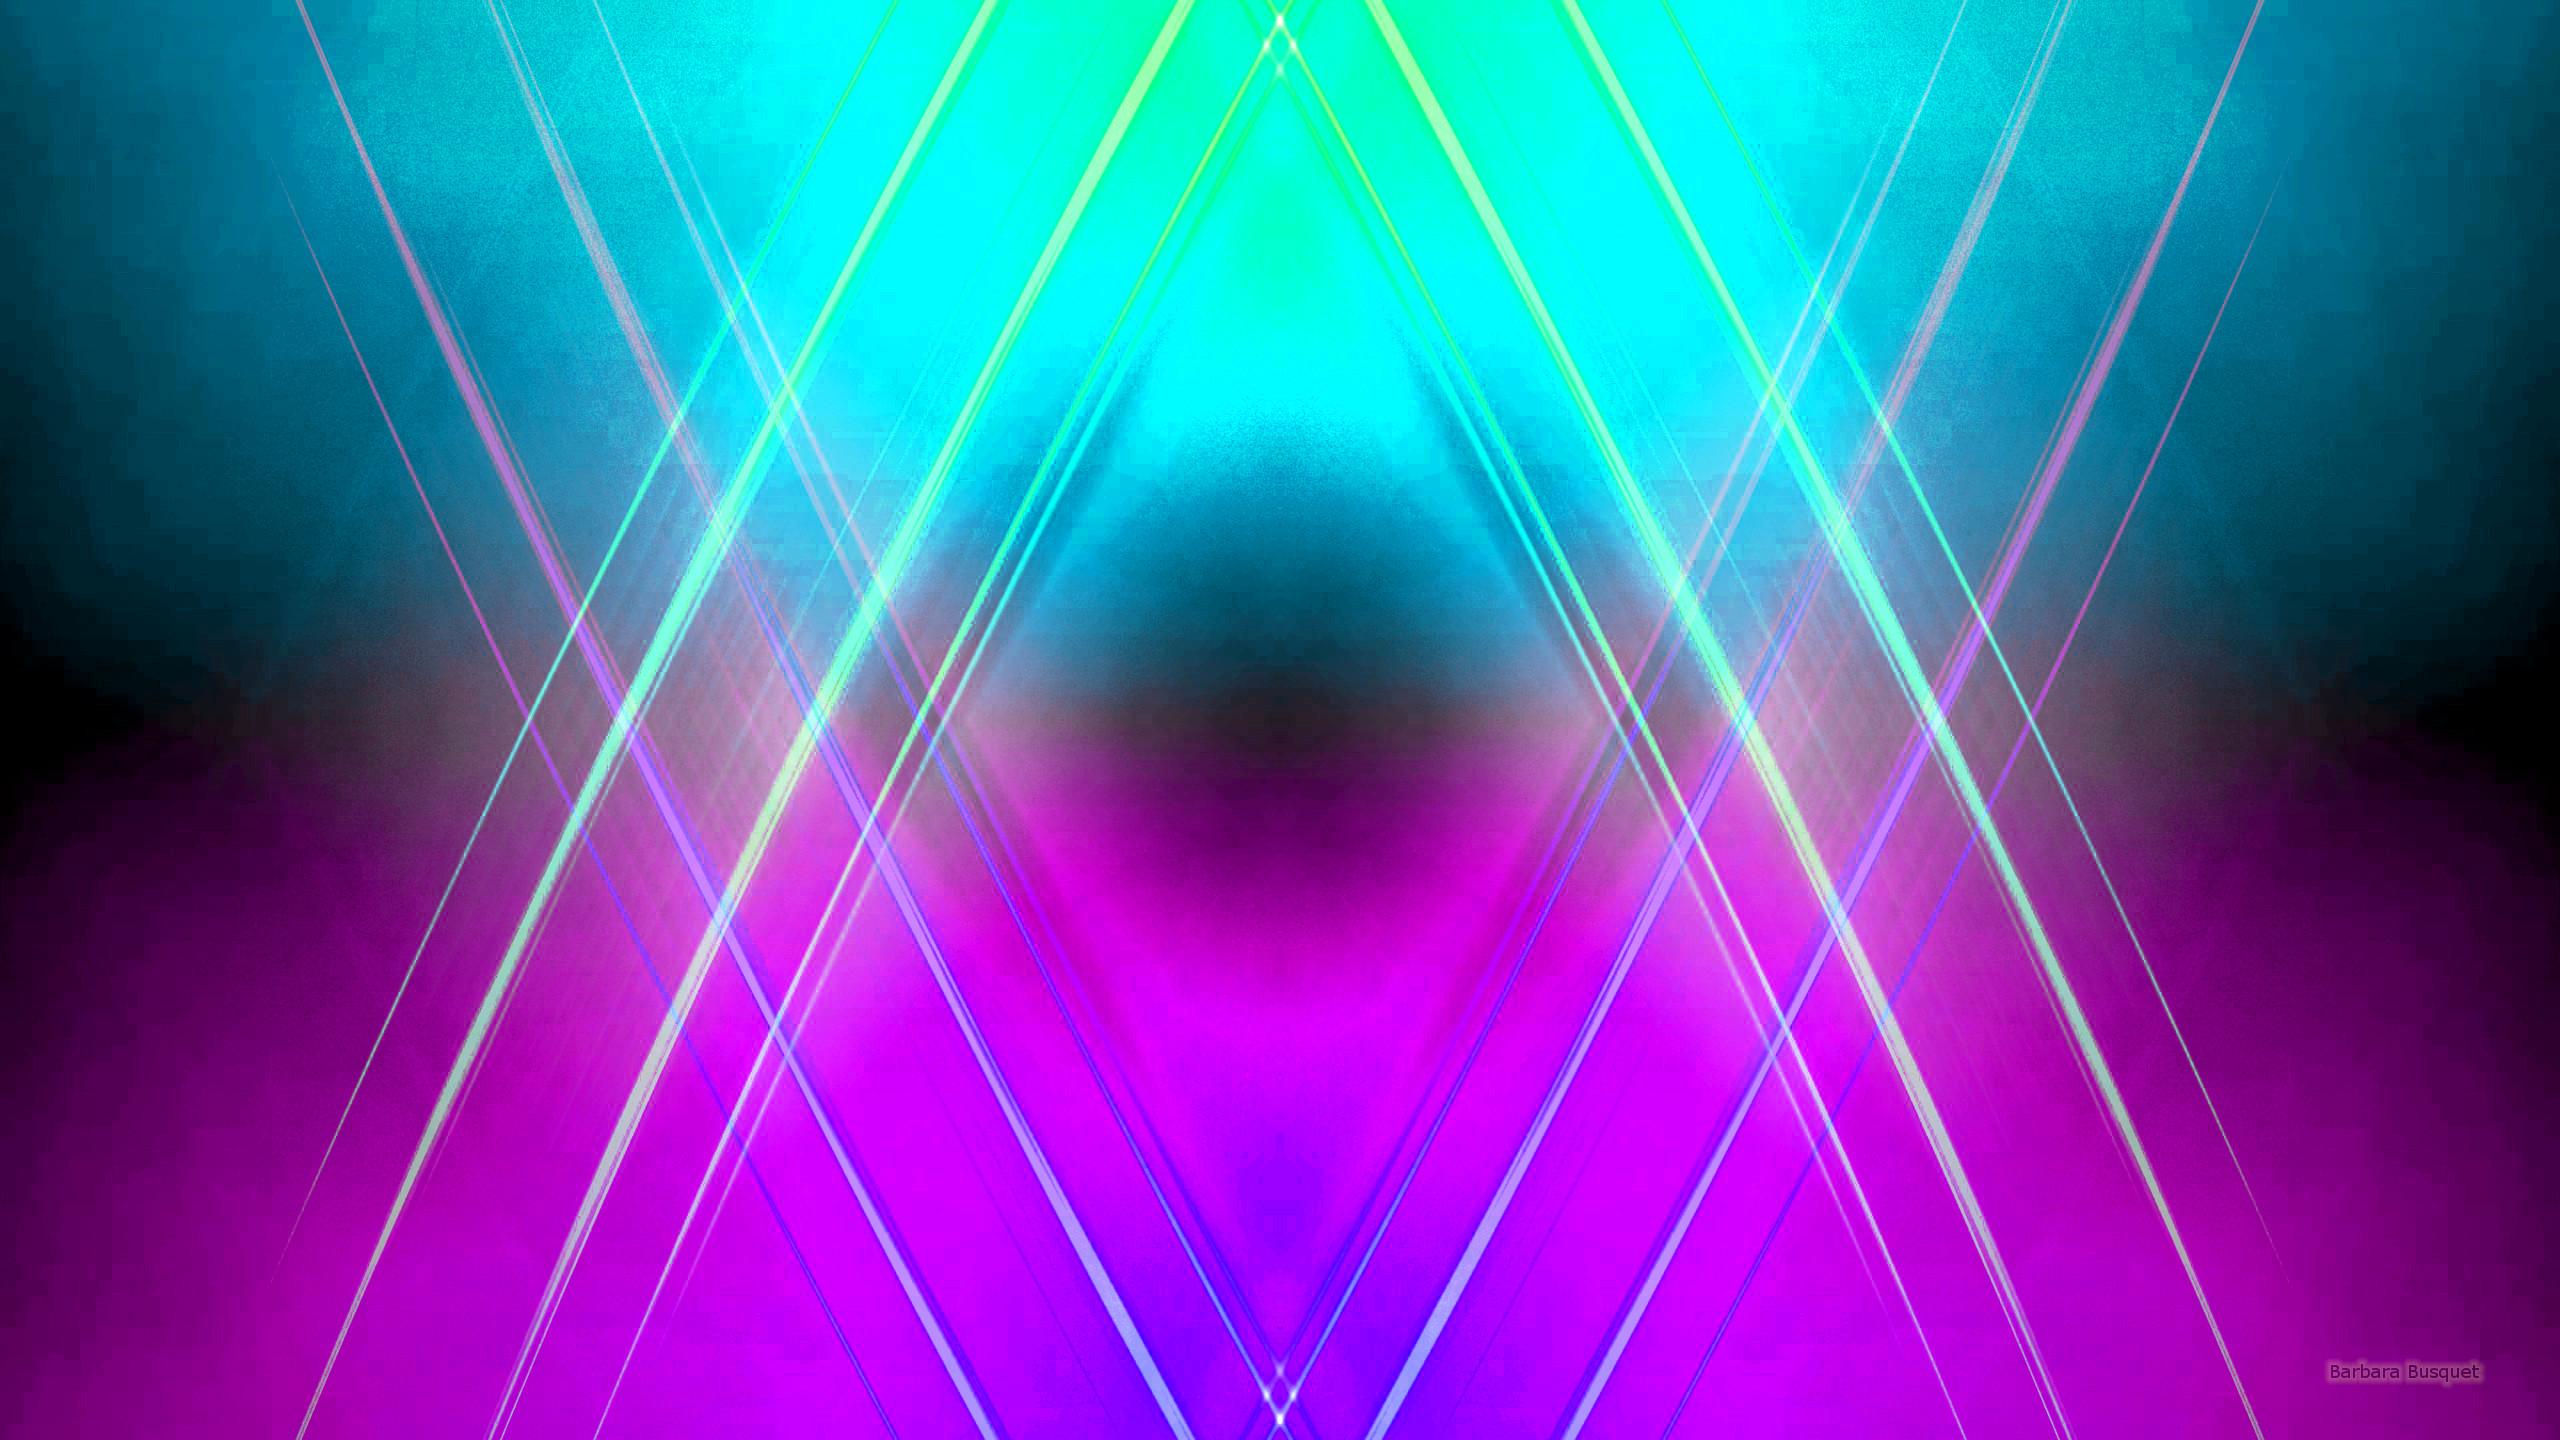 Abstract Symmetric Wallpaper Barbaras Hd Wallpapers